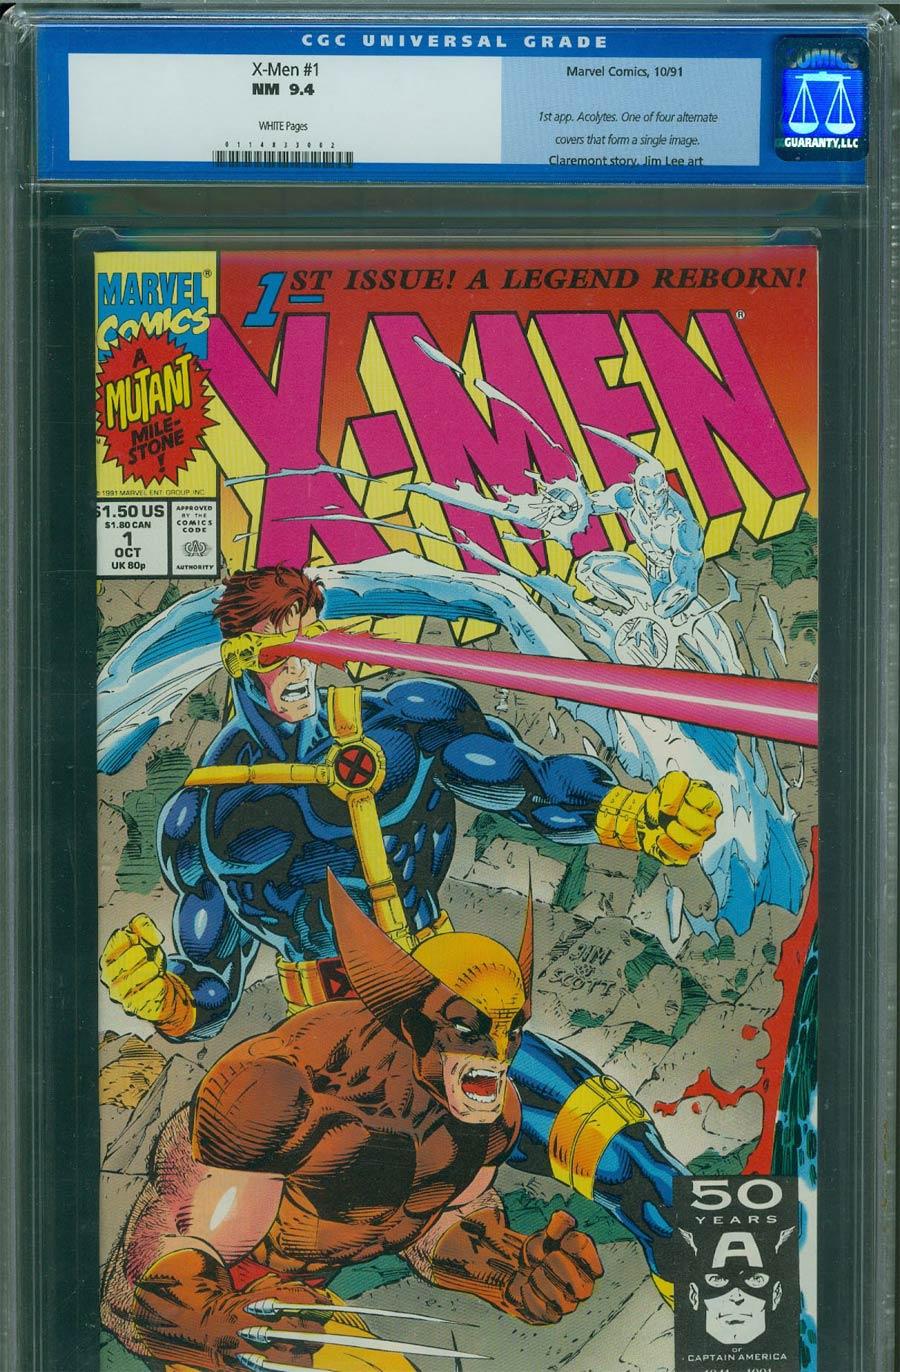 X-Men Vol 2 #1 Cover L Cyclops/Wolverine CGC 9.4